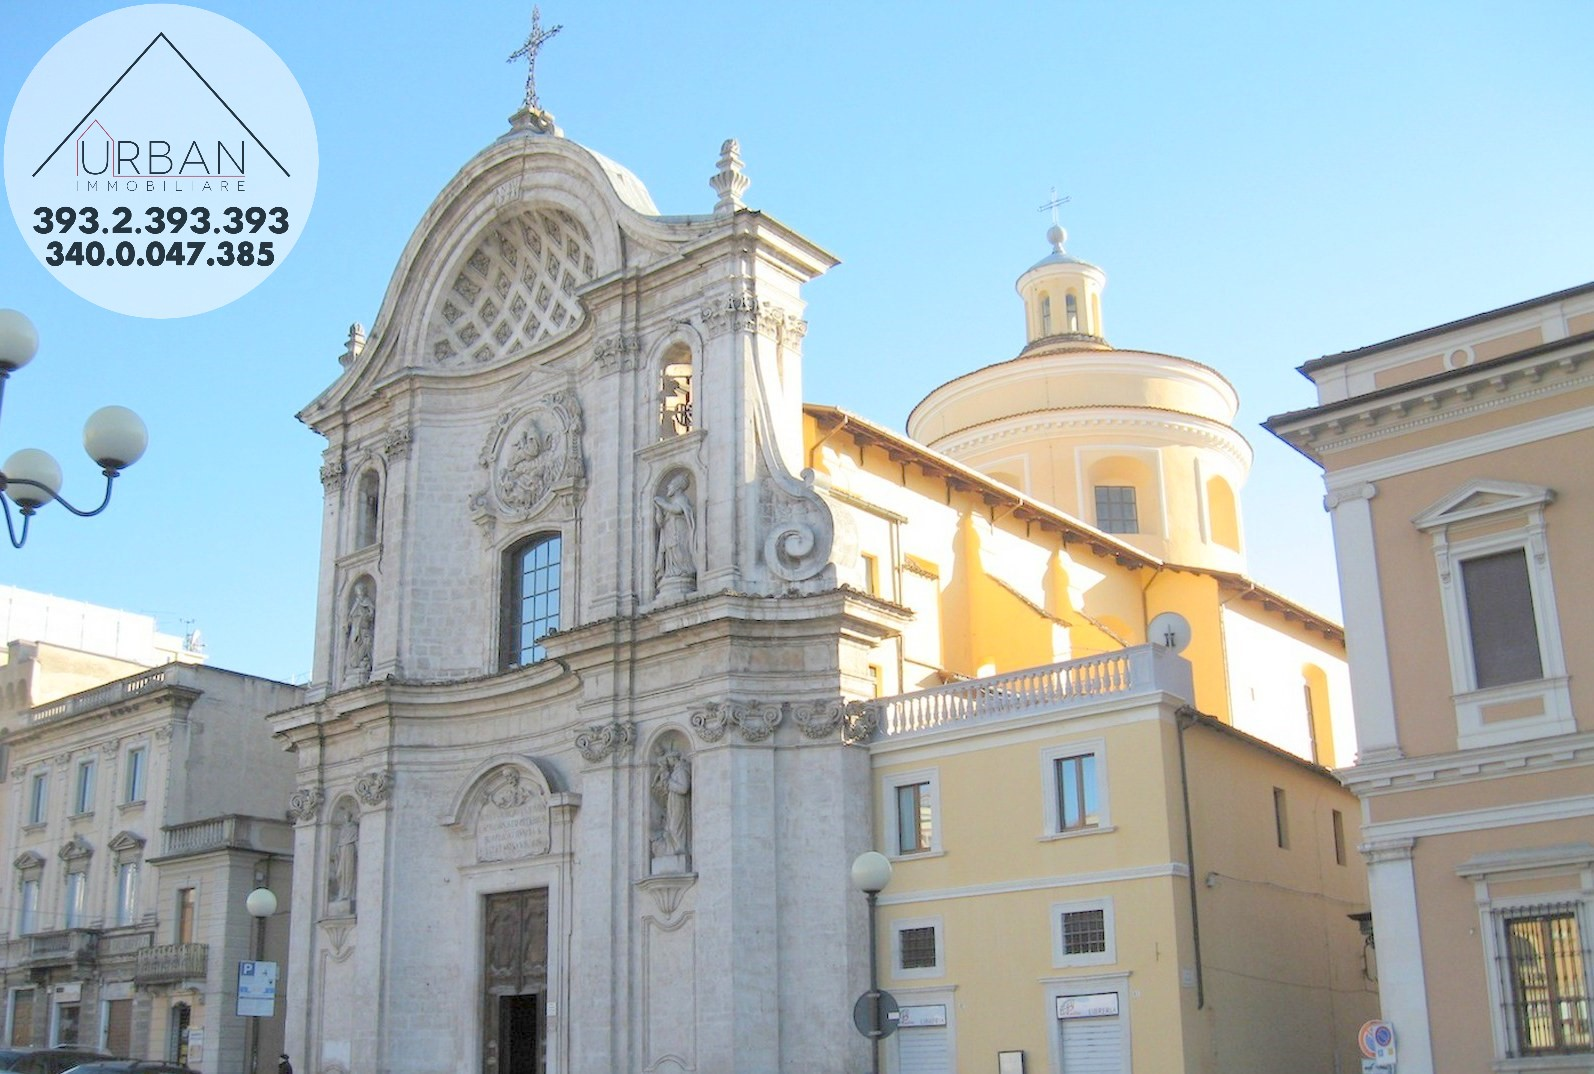 L'AQUILA (AQ) - Piazza Duomo